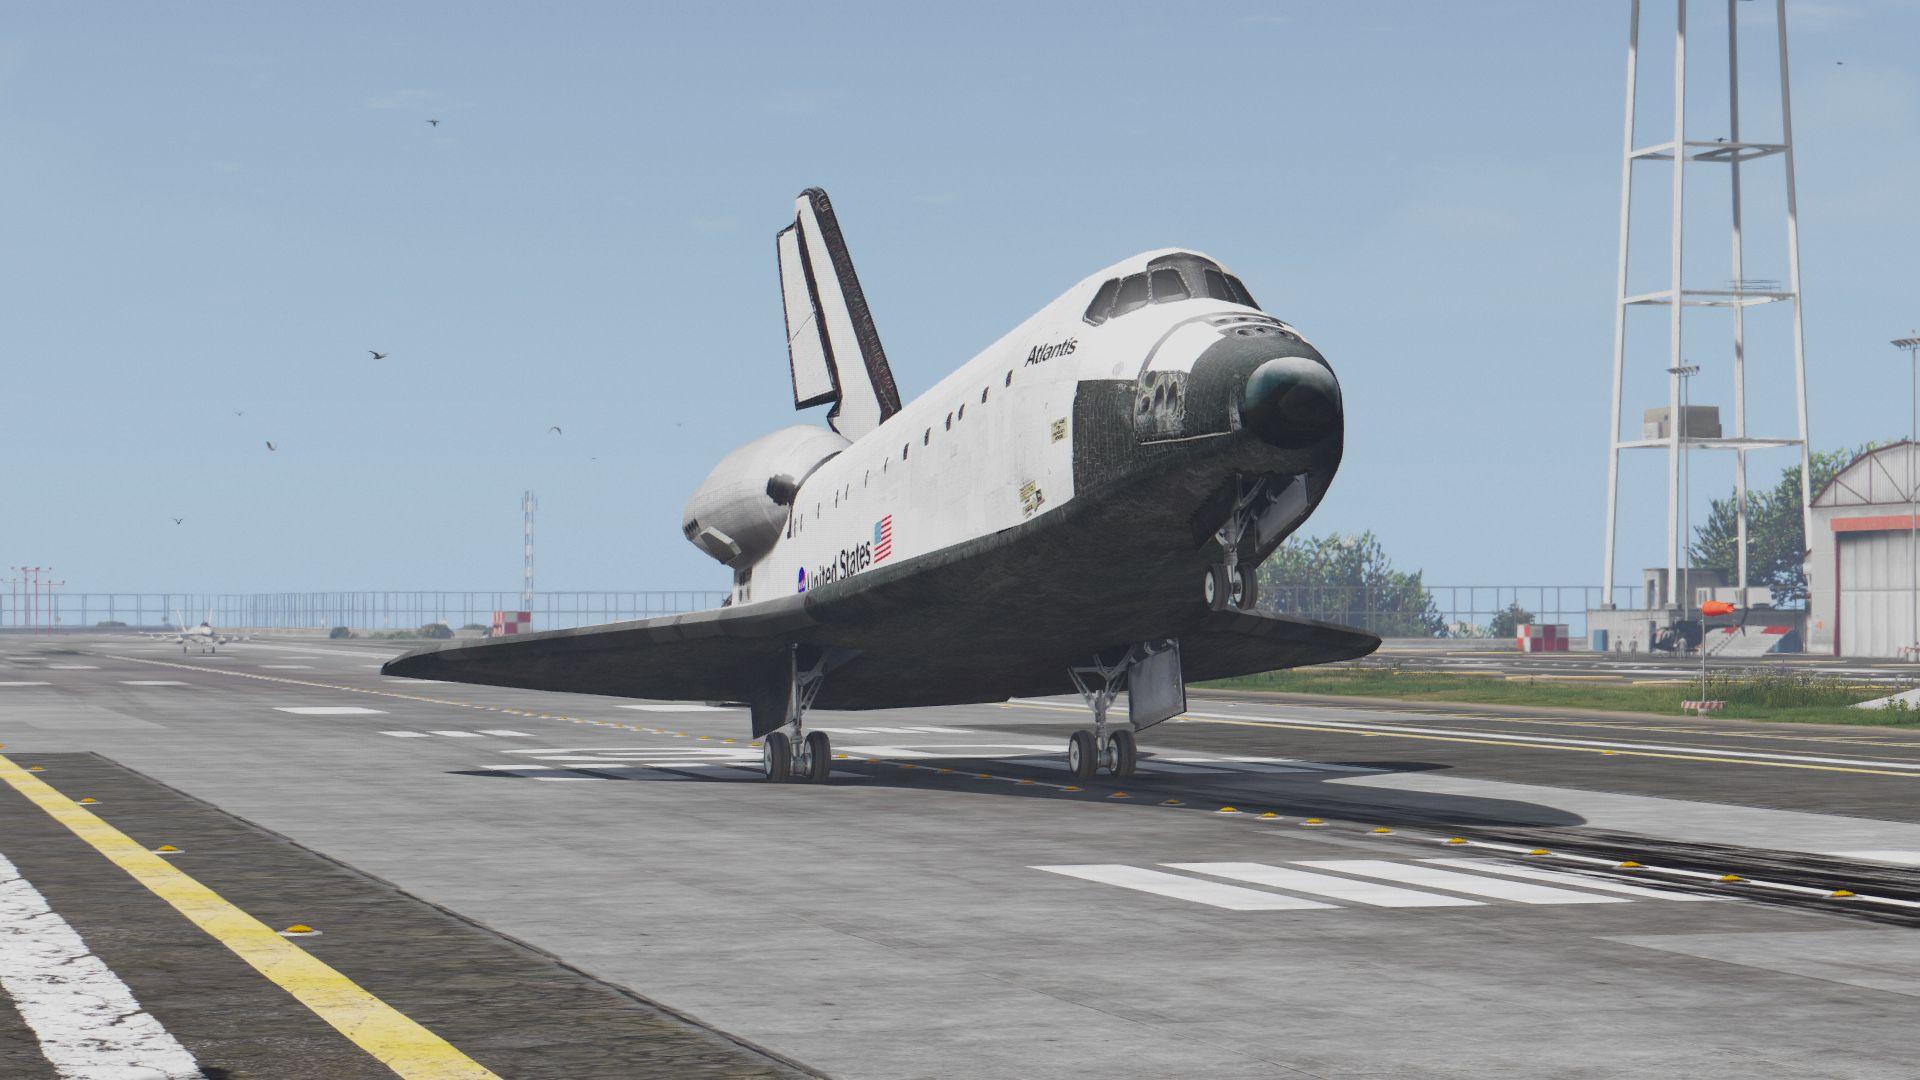 astronaut space shuttle - photo #30